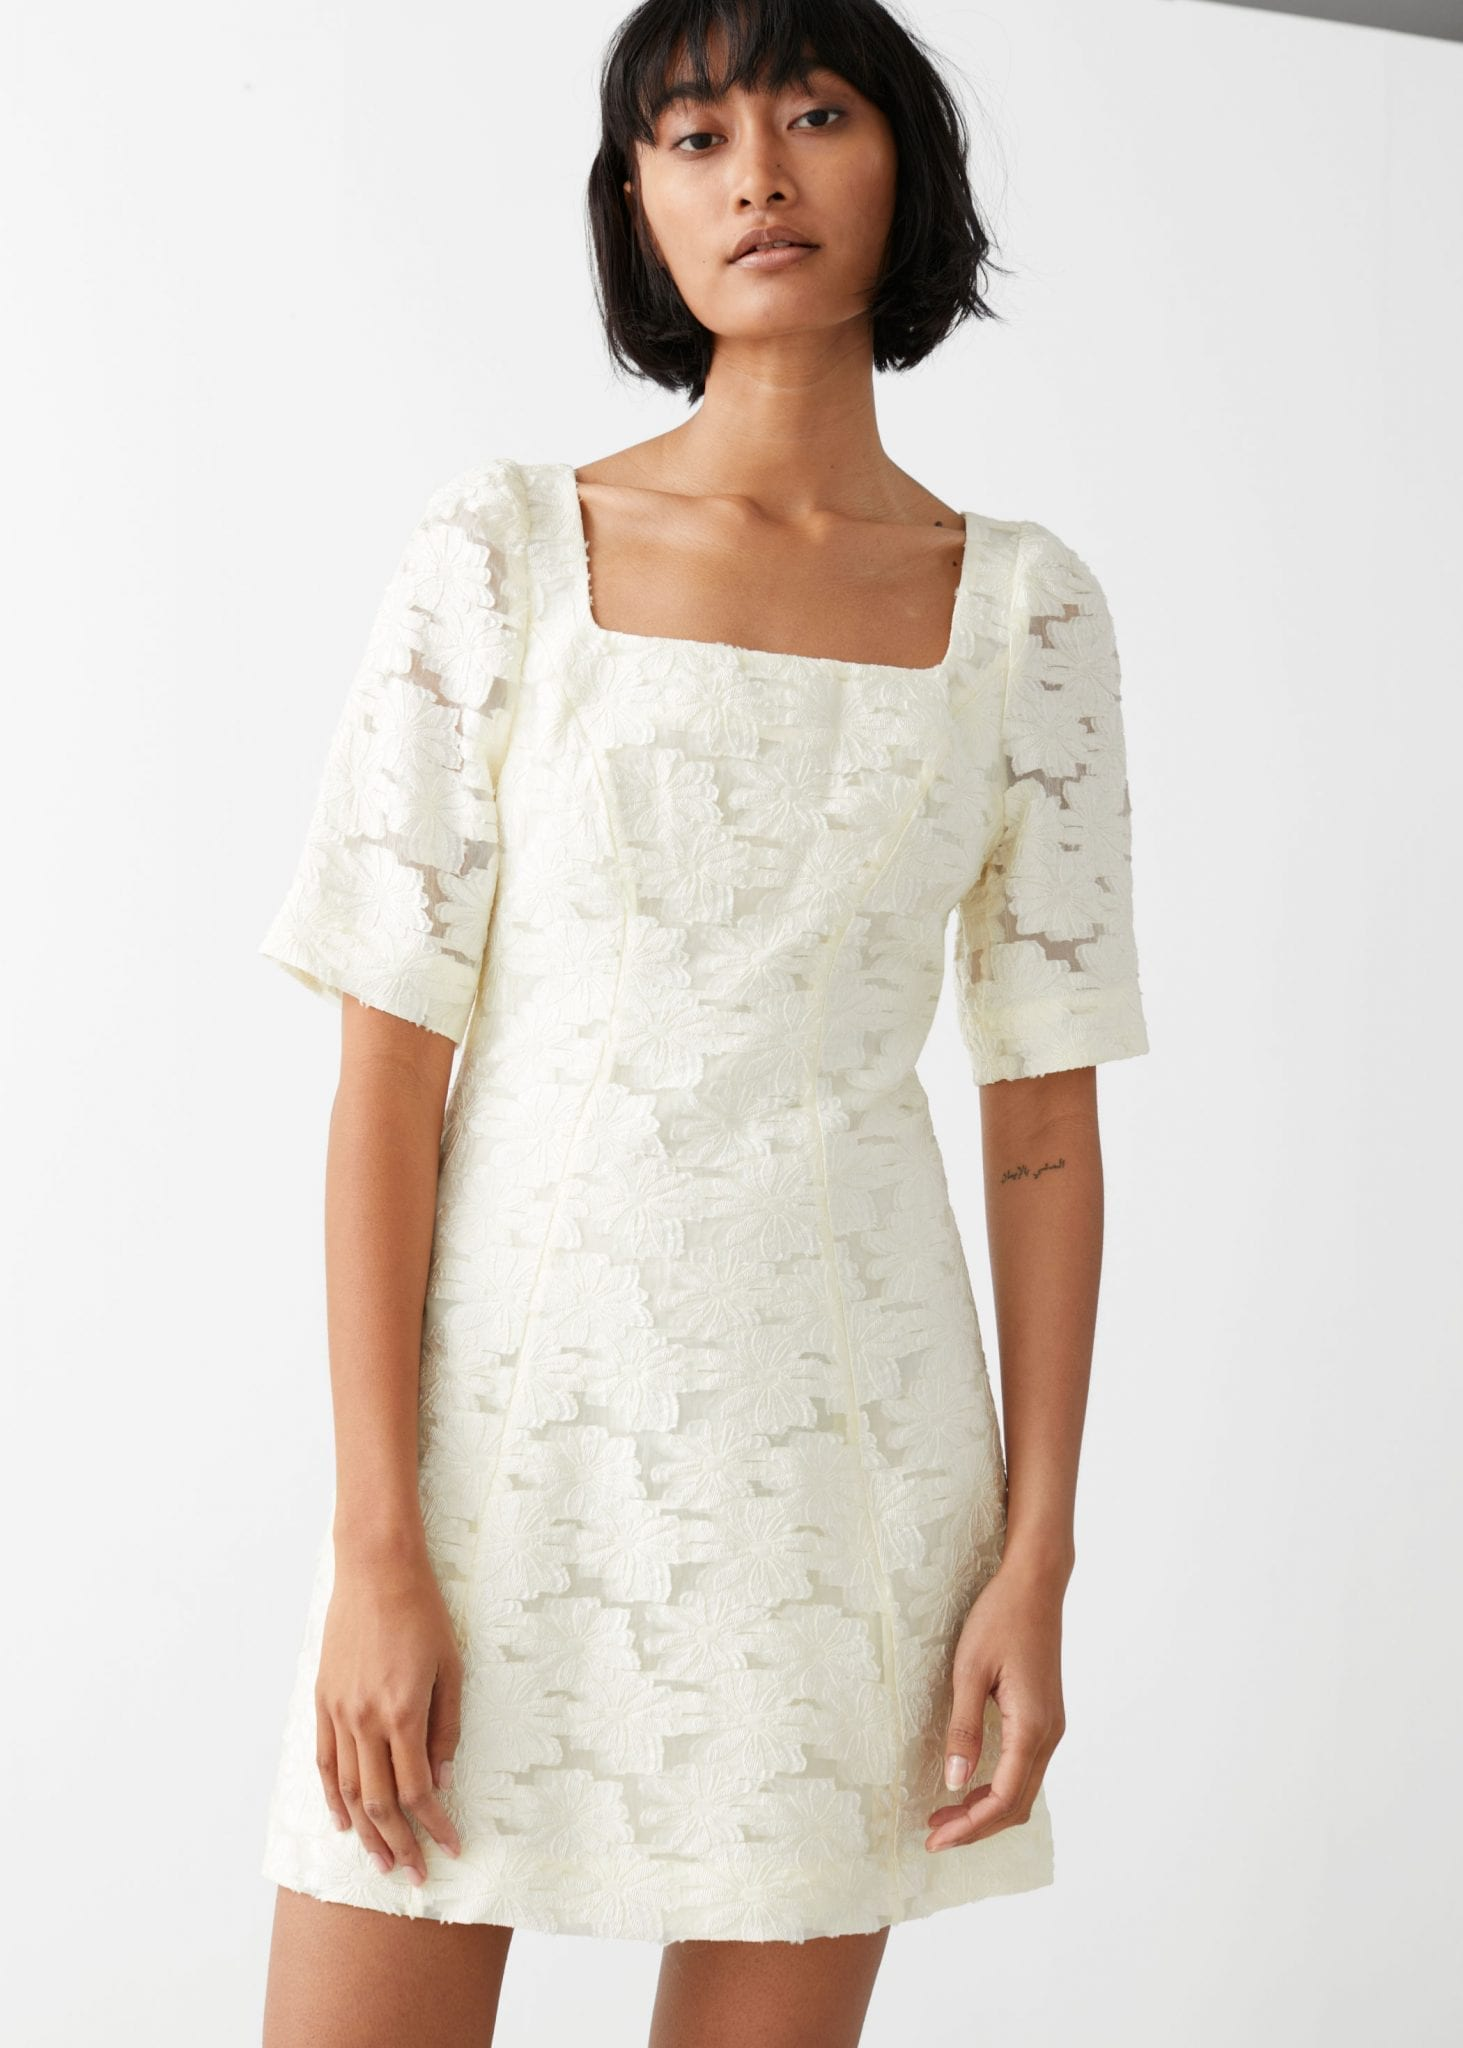 & OTHER STORIES Flower Jacquard Mini Dress